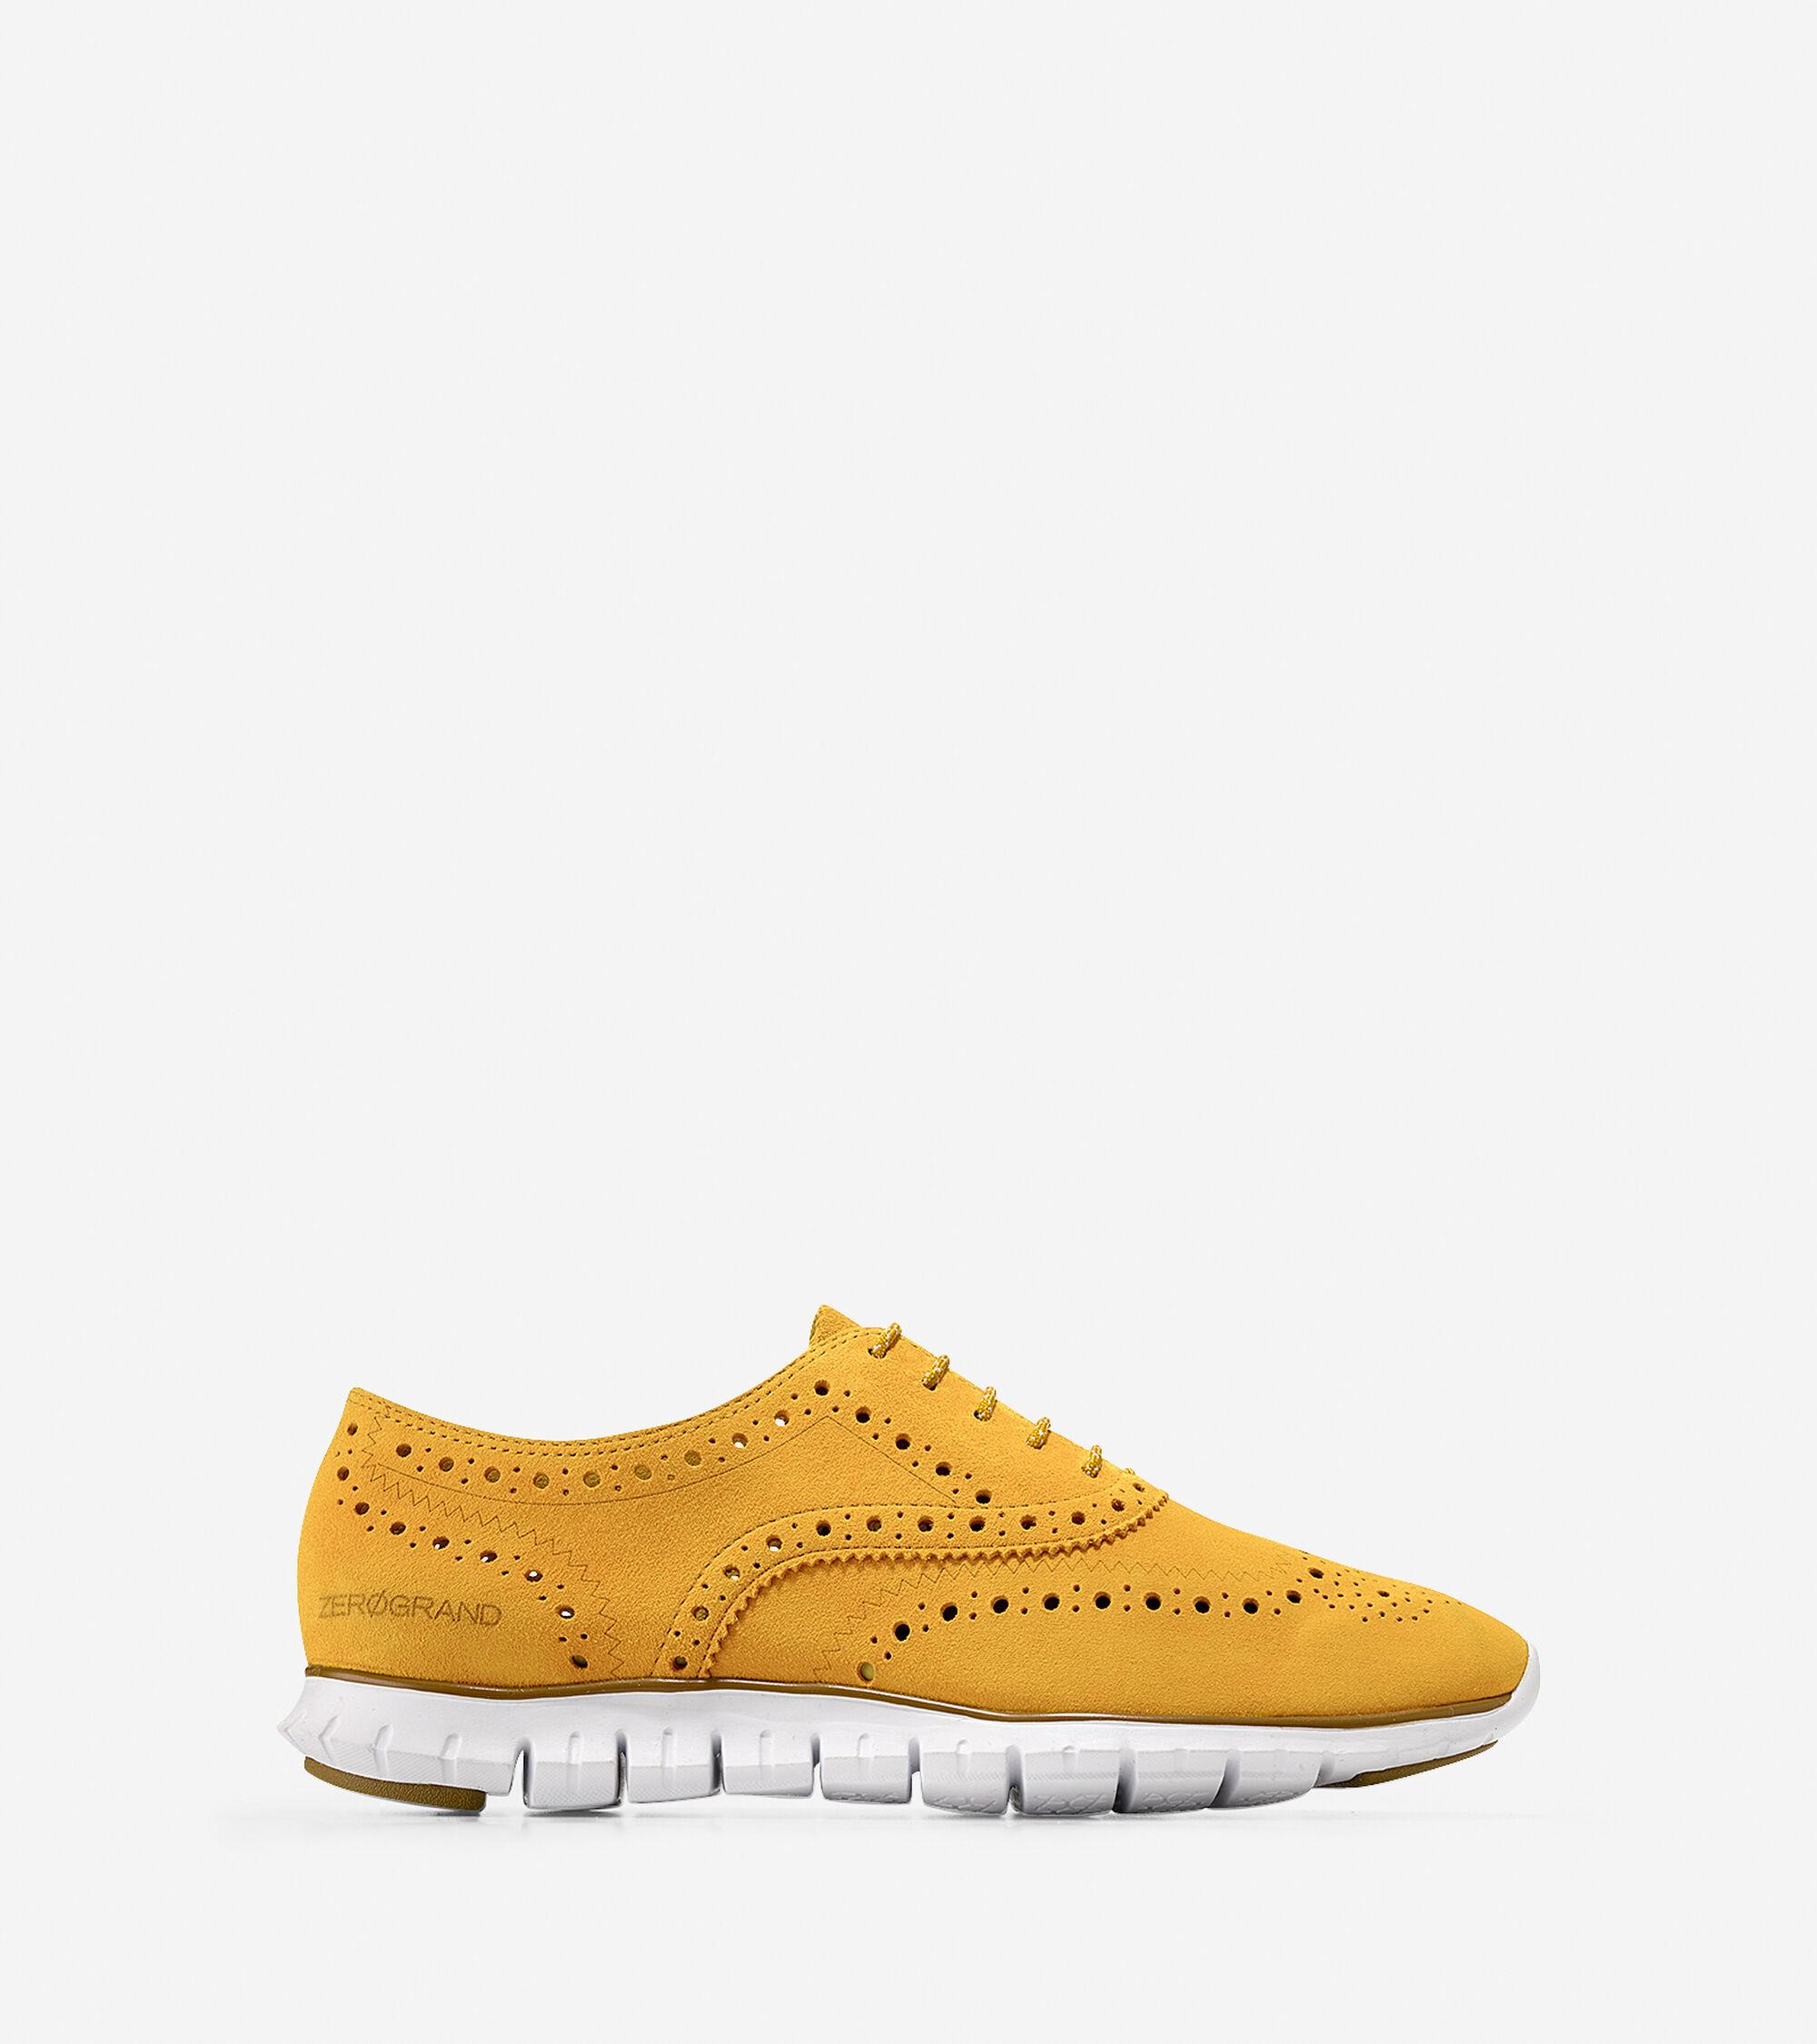 Shoes > ZERØGRAND Wingtip Oxford